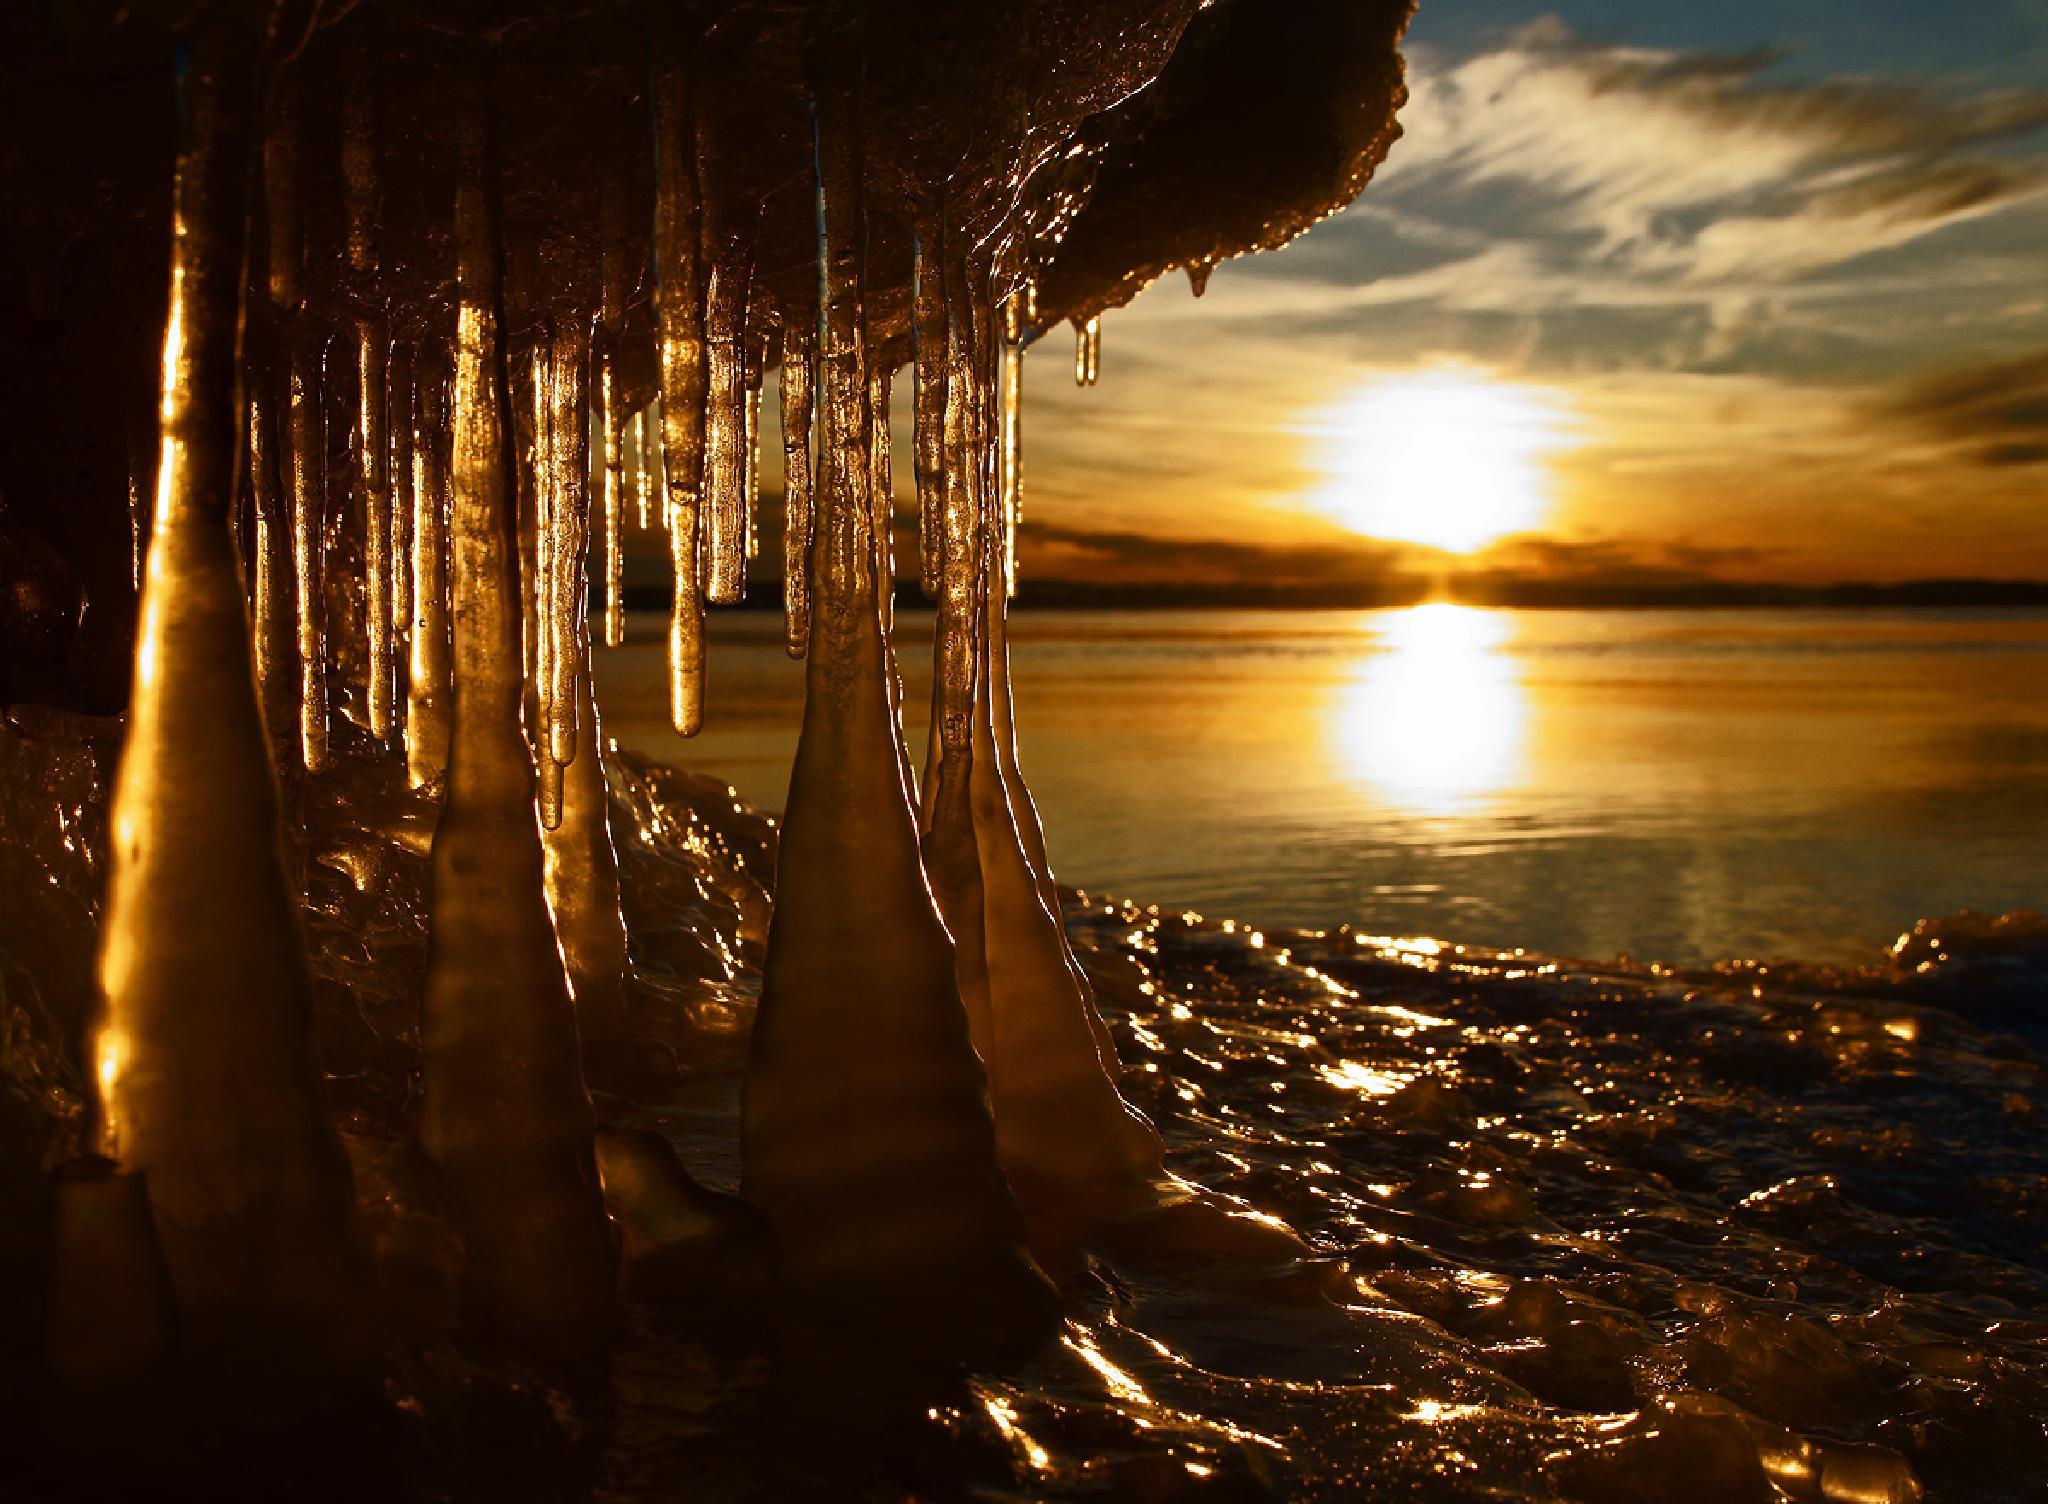 Icestalactites by Peter Samuelsson